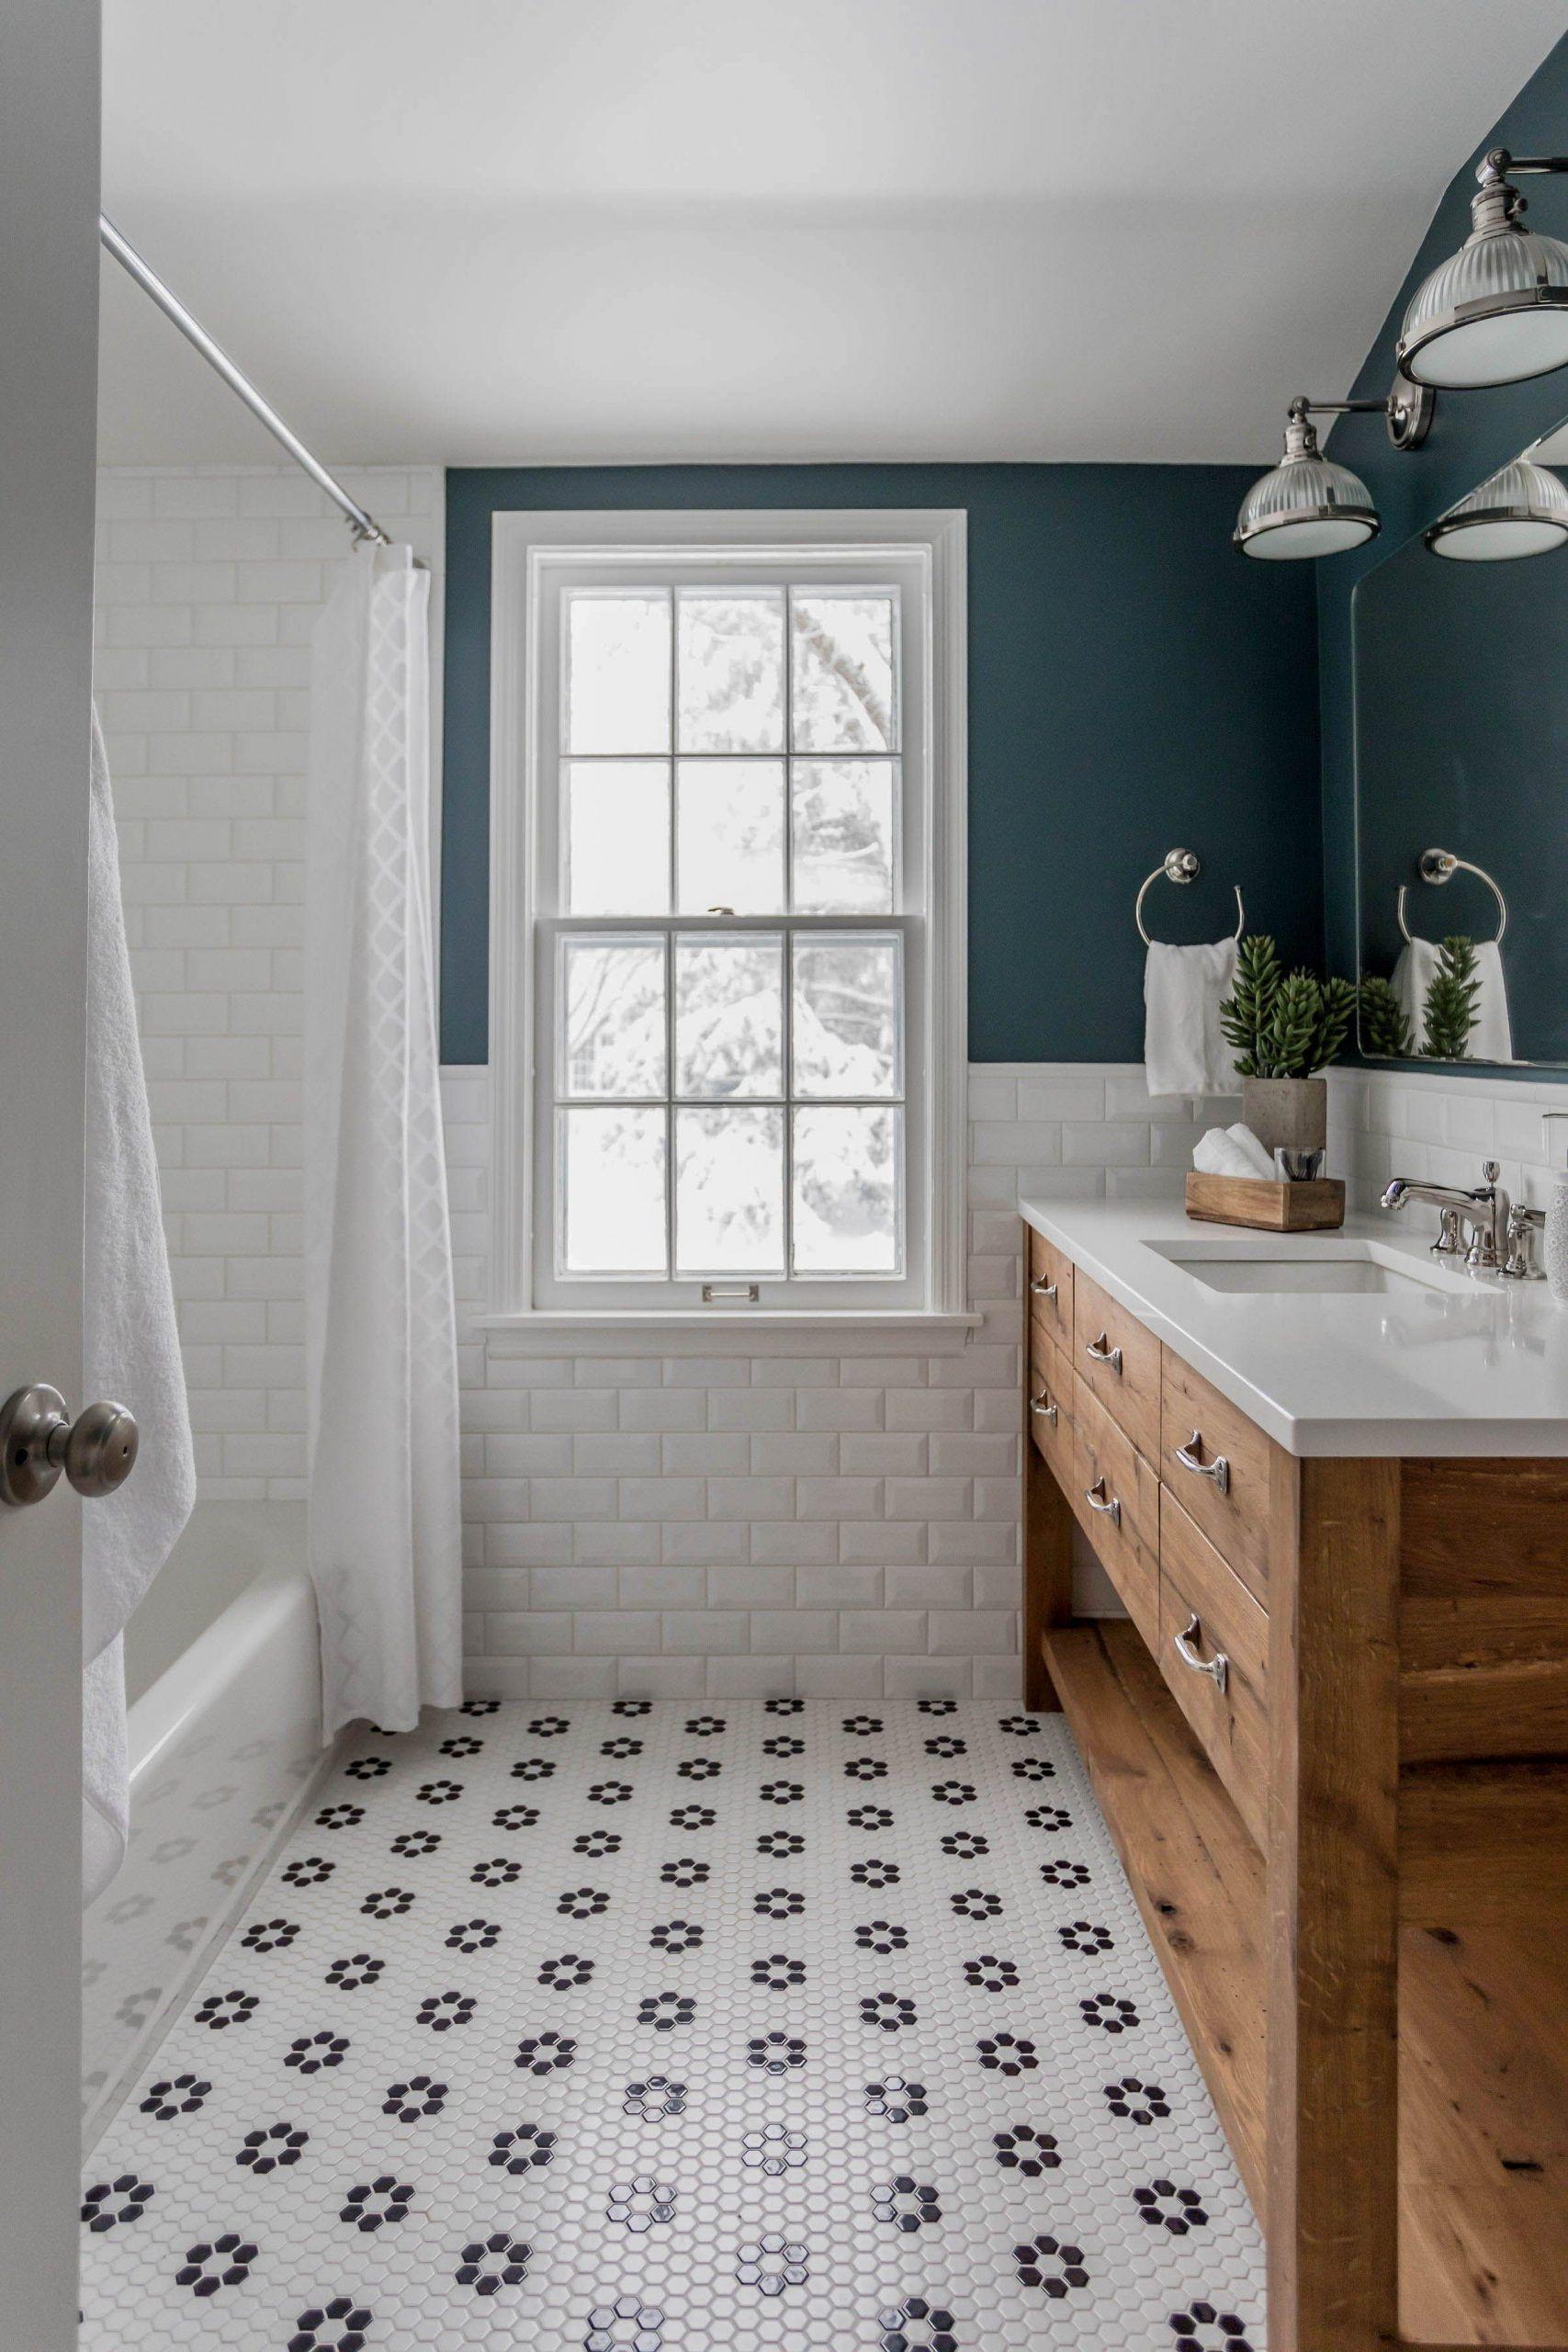 Reclaimed Wood Vanity Black And White Tile Subway Tile Dark Green Bathroom Wa Bathroom Black D In 2020 Green Bathroom Dark Green Bathrooms Bathroom Inspiration [ 2560 x 1707 Pixel ]